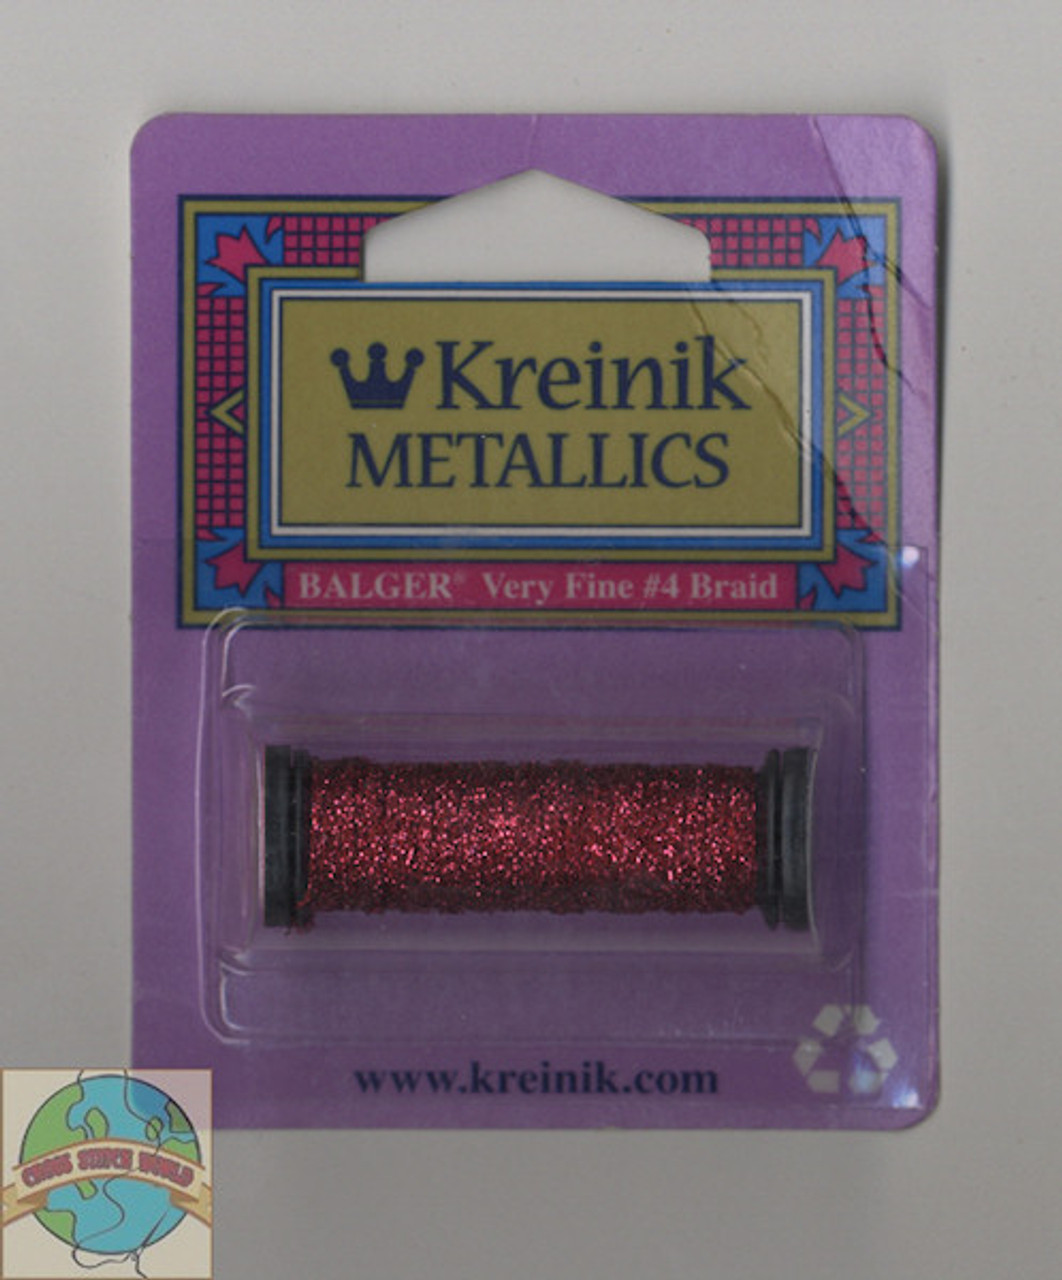 Kreinik Metallics - Very Fine #4 Crimson 031